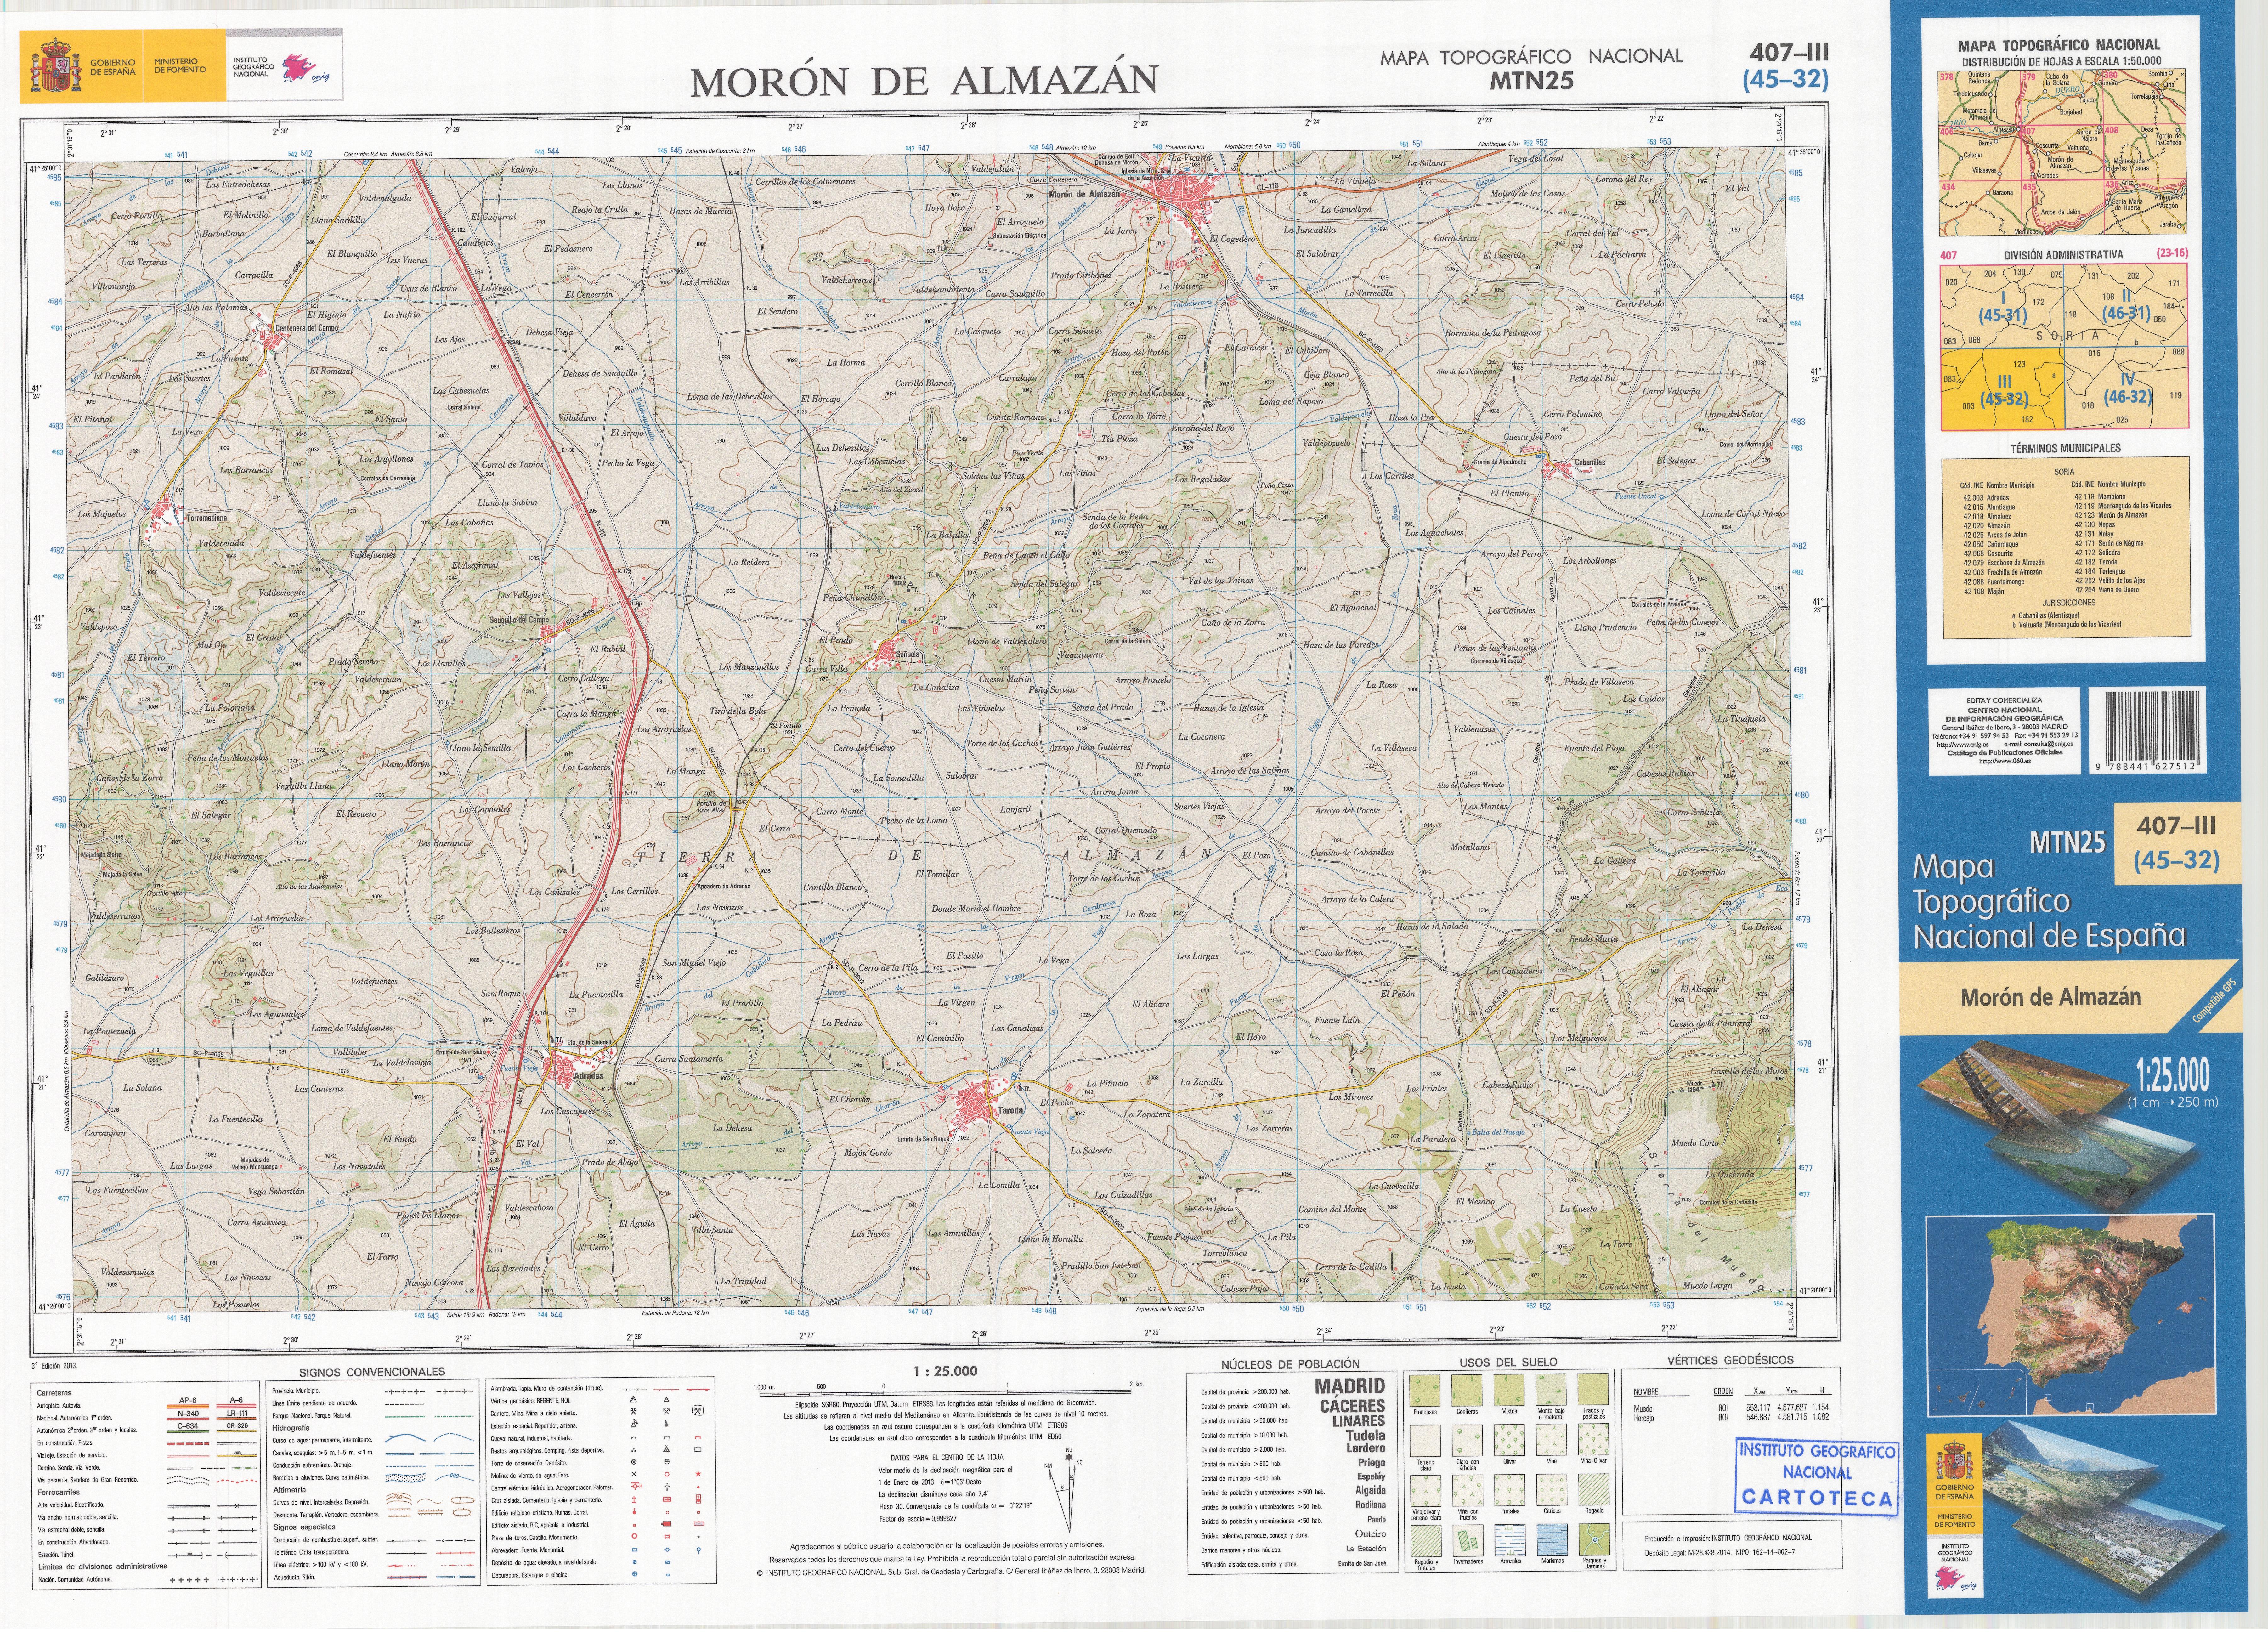 Moron Spain Map.File Mtn25 0407c3 2013 Moron De Almazan Jpg Wikimedia Commons